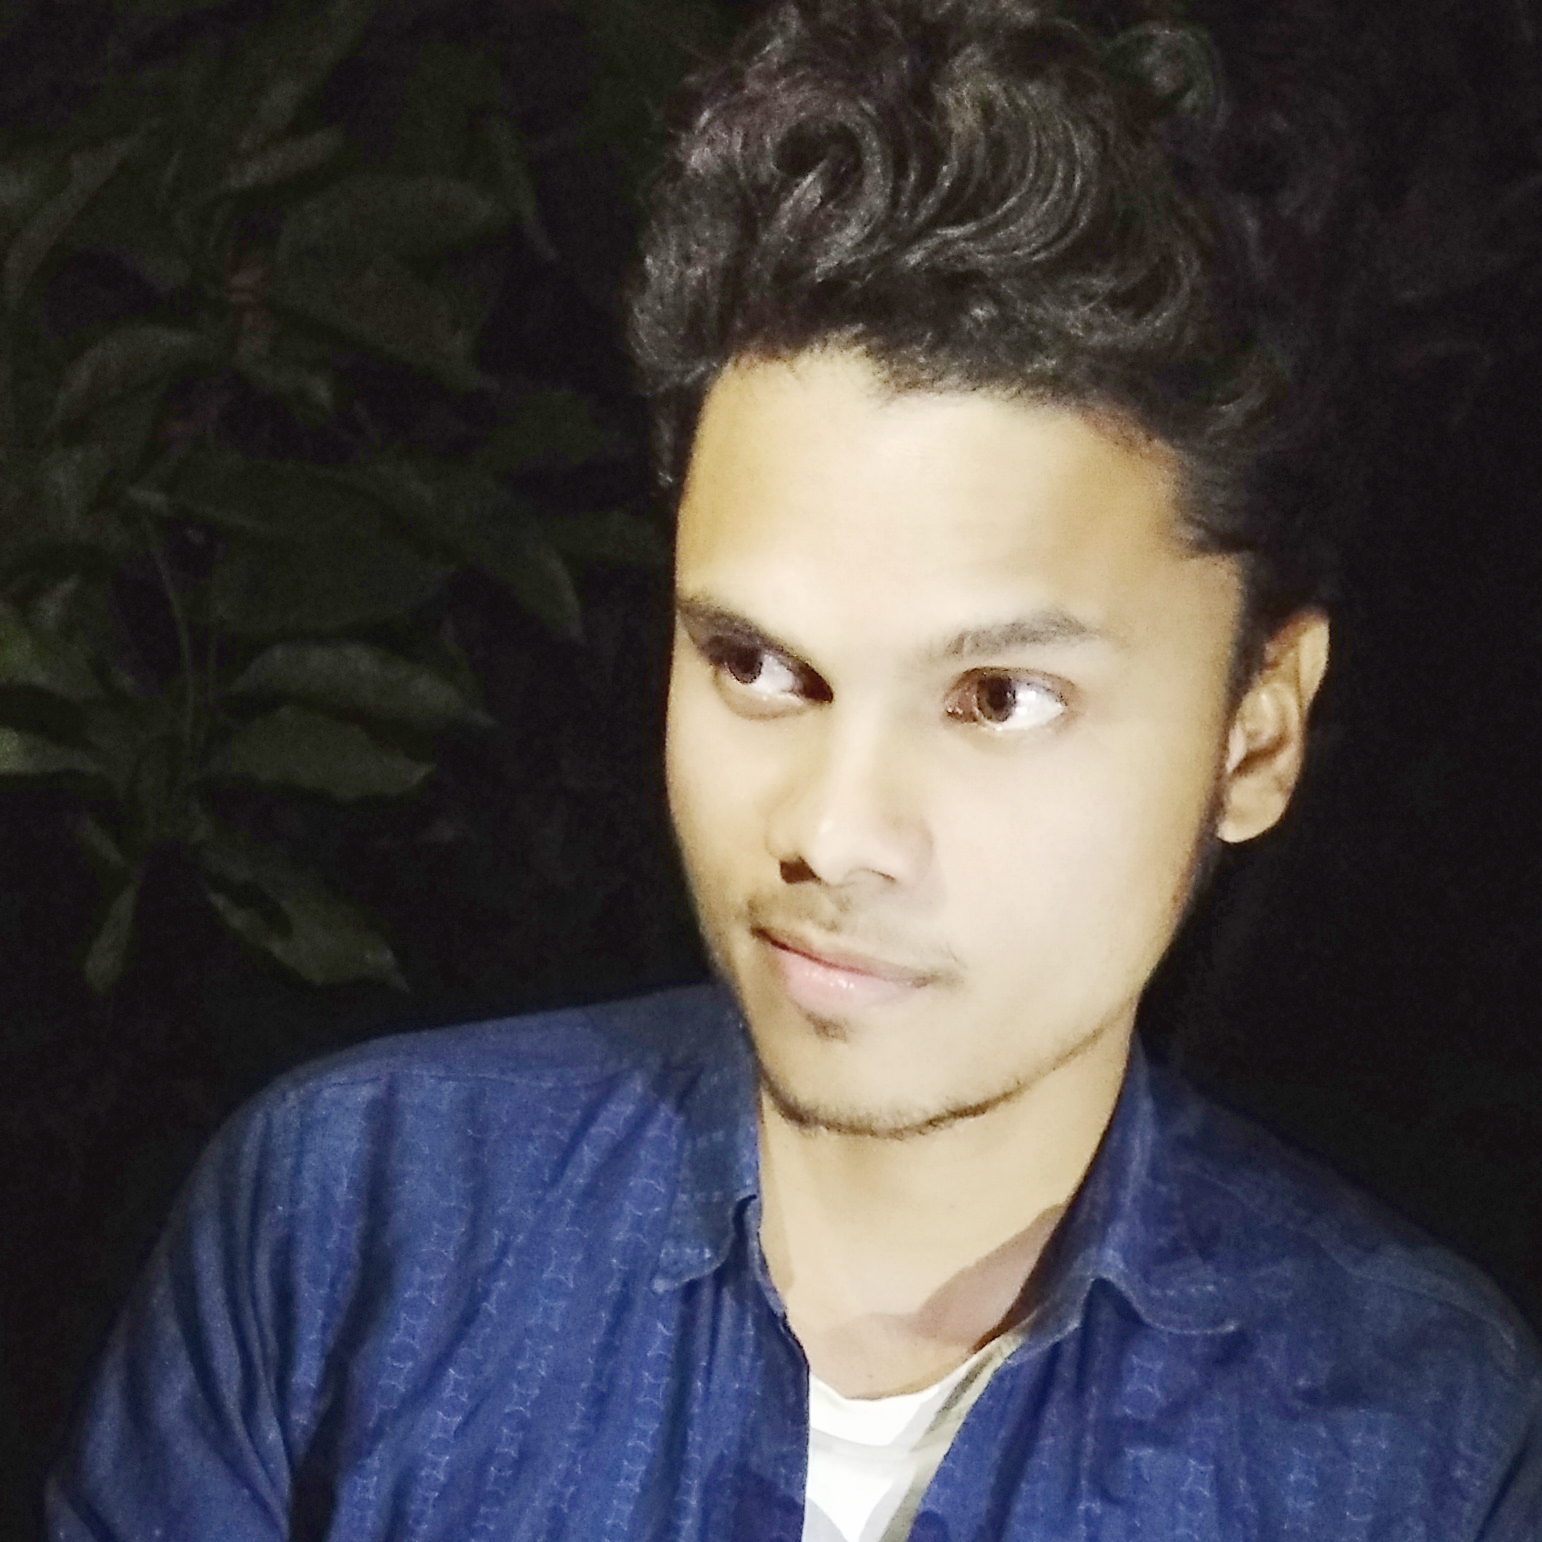 Rahul Kumar Uike